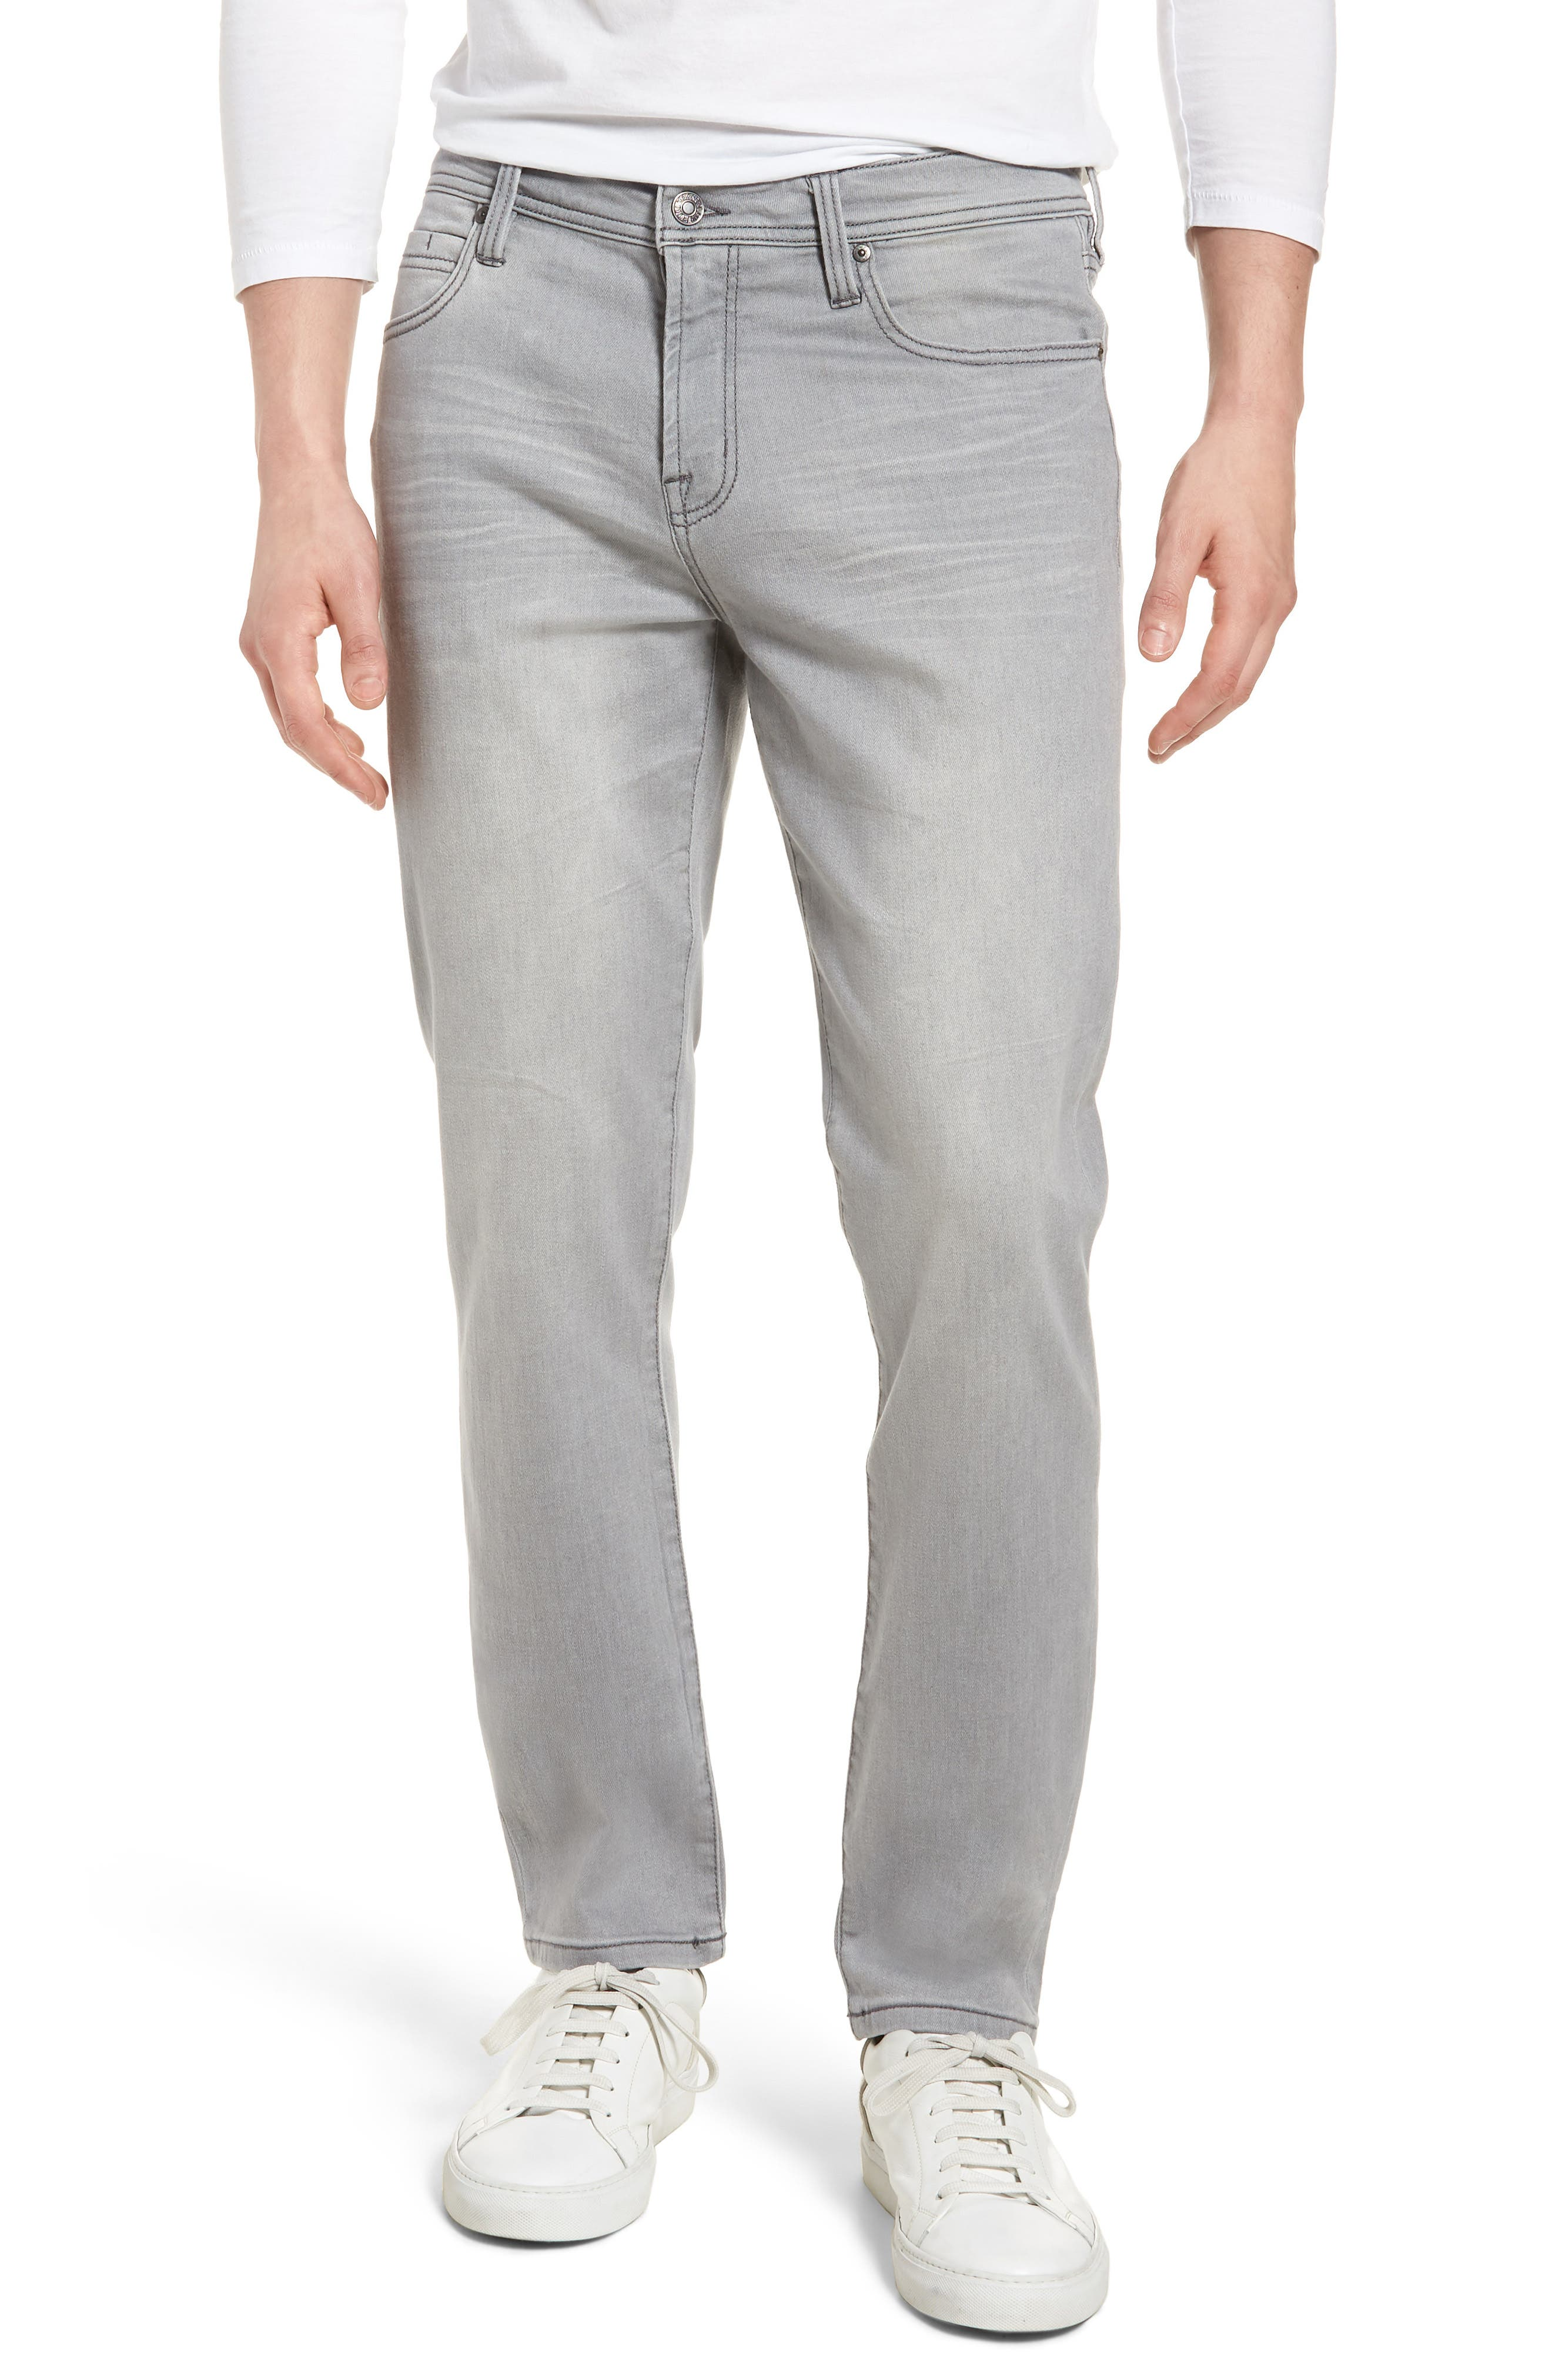 Main Image - Liverpool Jeans Co. Kingston Slim Straight Leg Jeans (Coal Mine Dark)